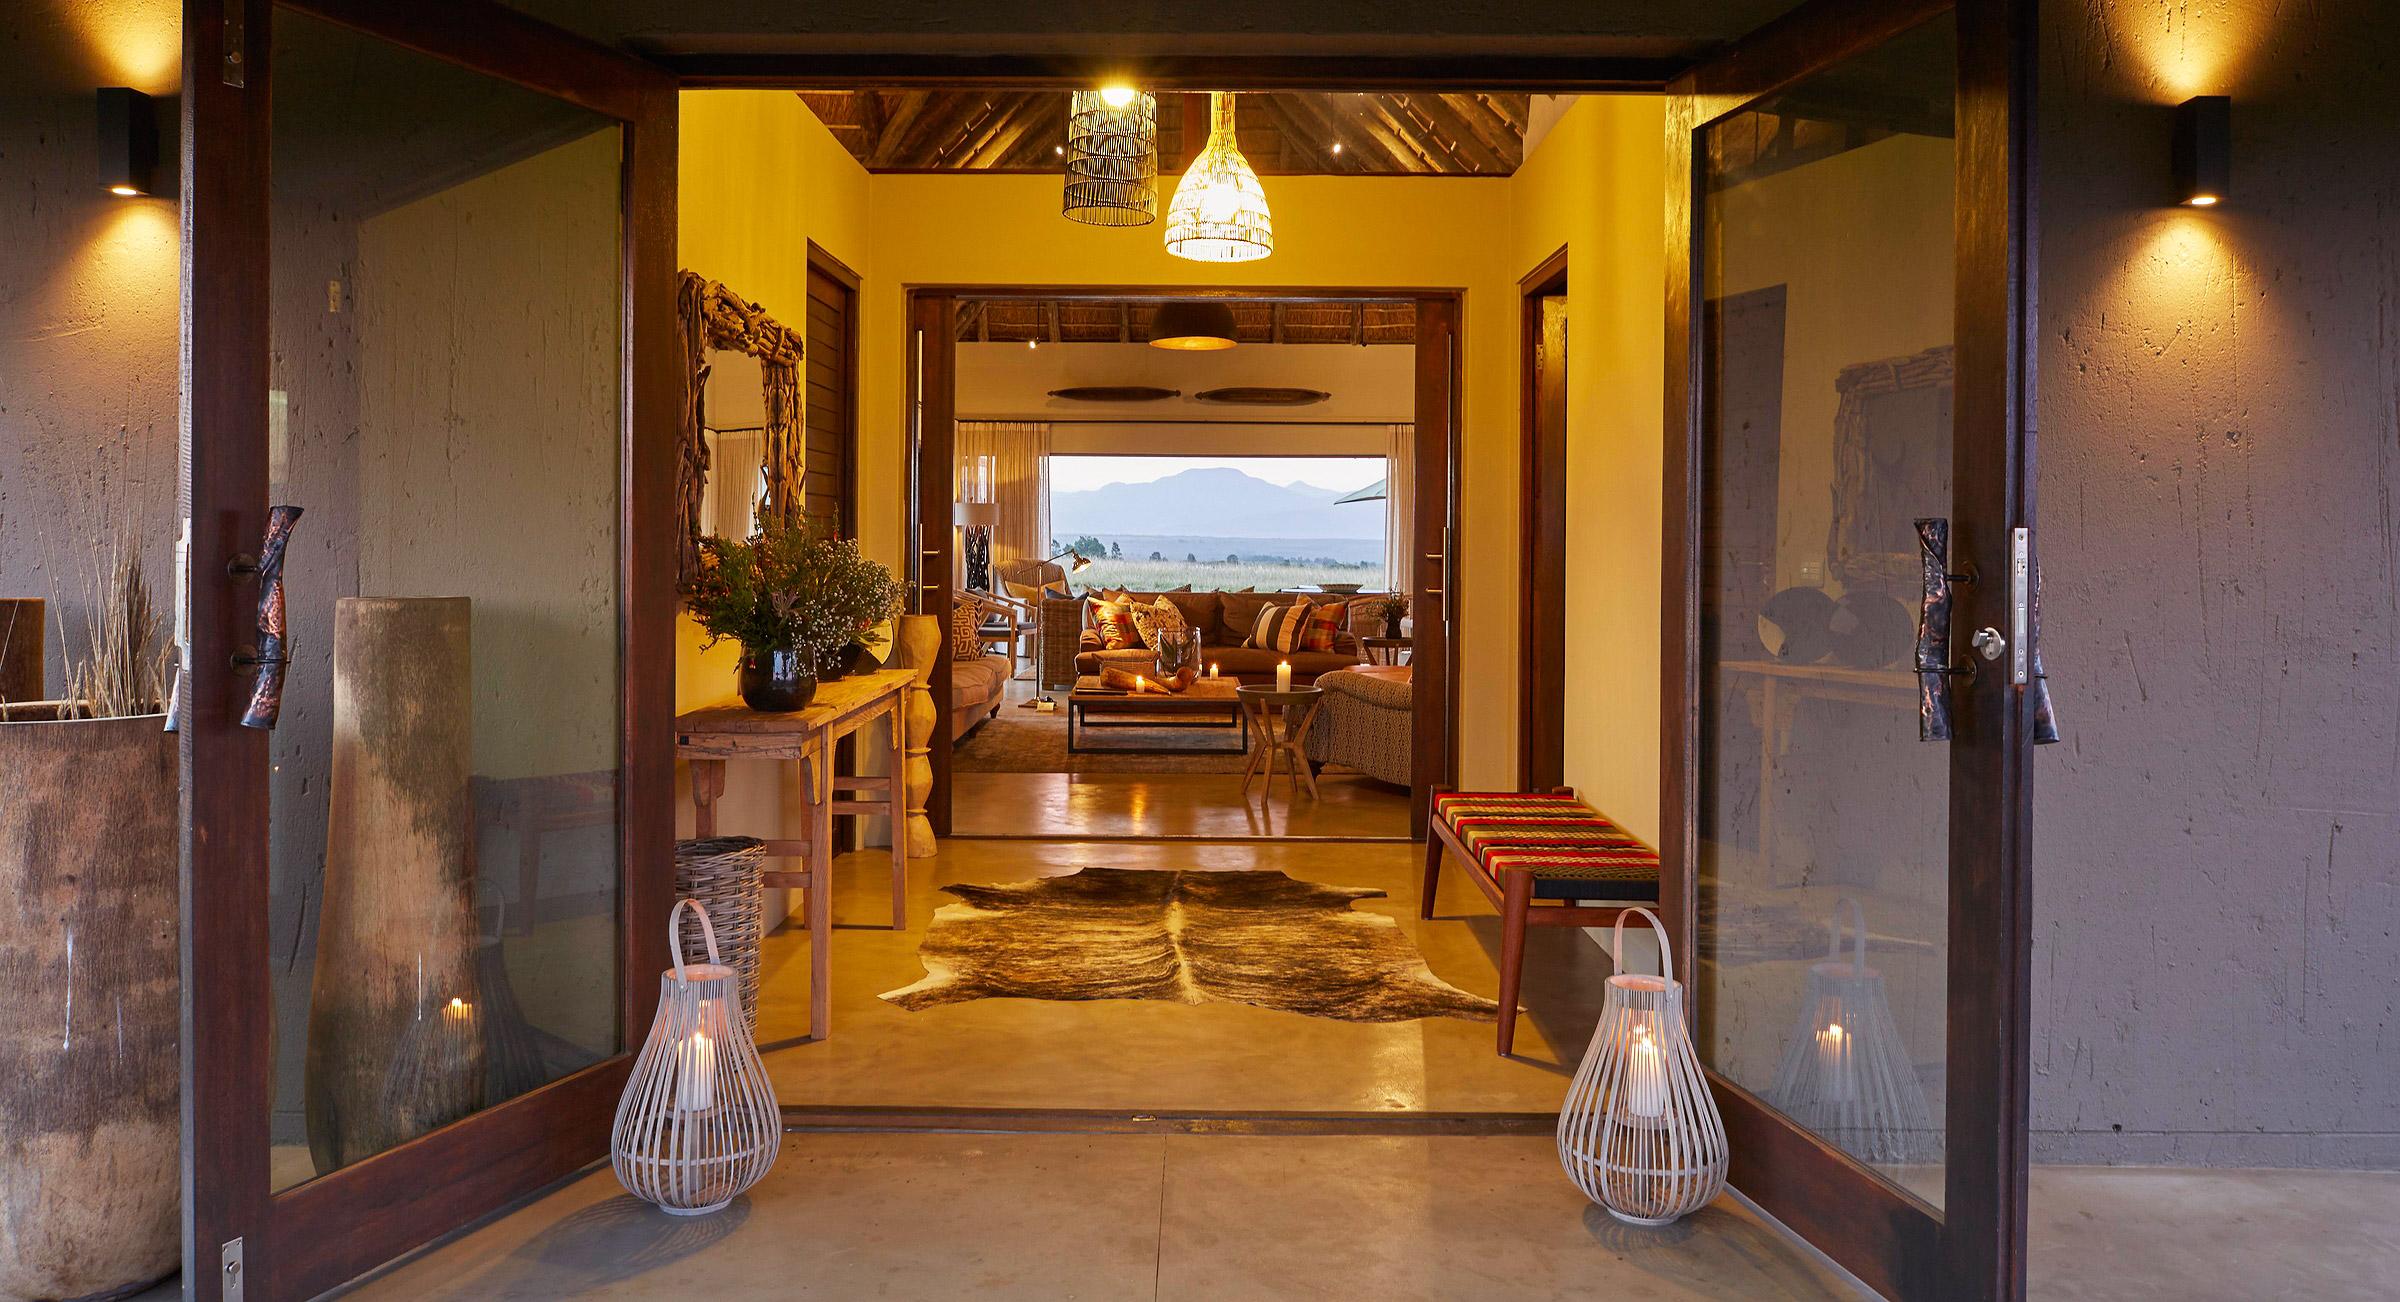 Ulubisi House The New Luxury Safari Villa At Gondwana Game Reserve